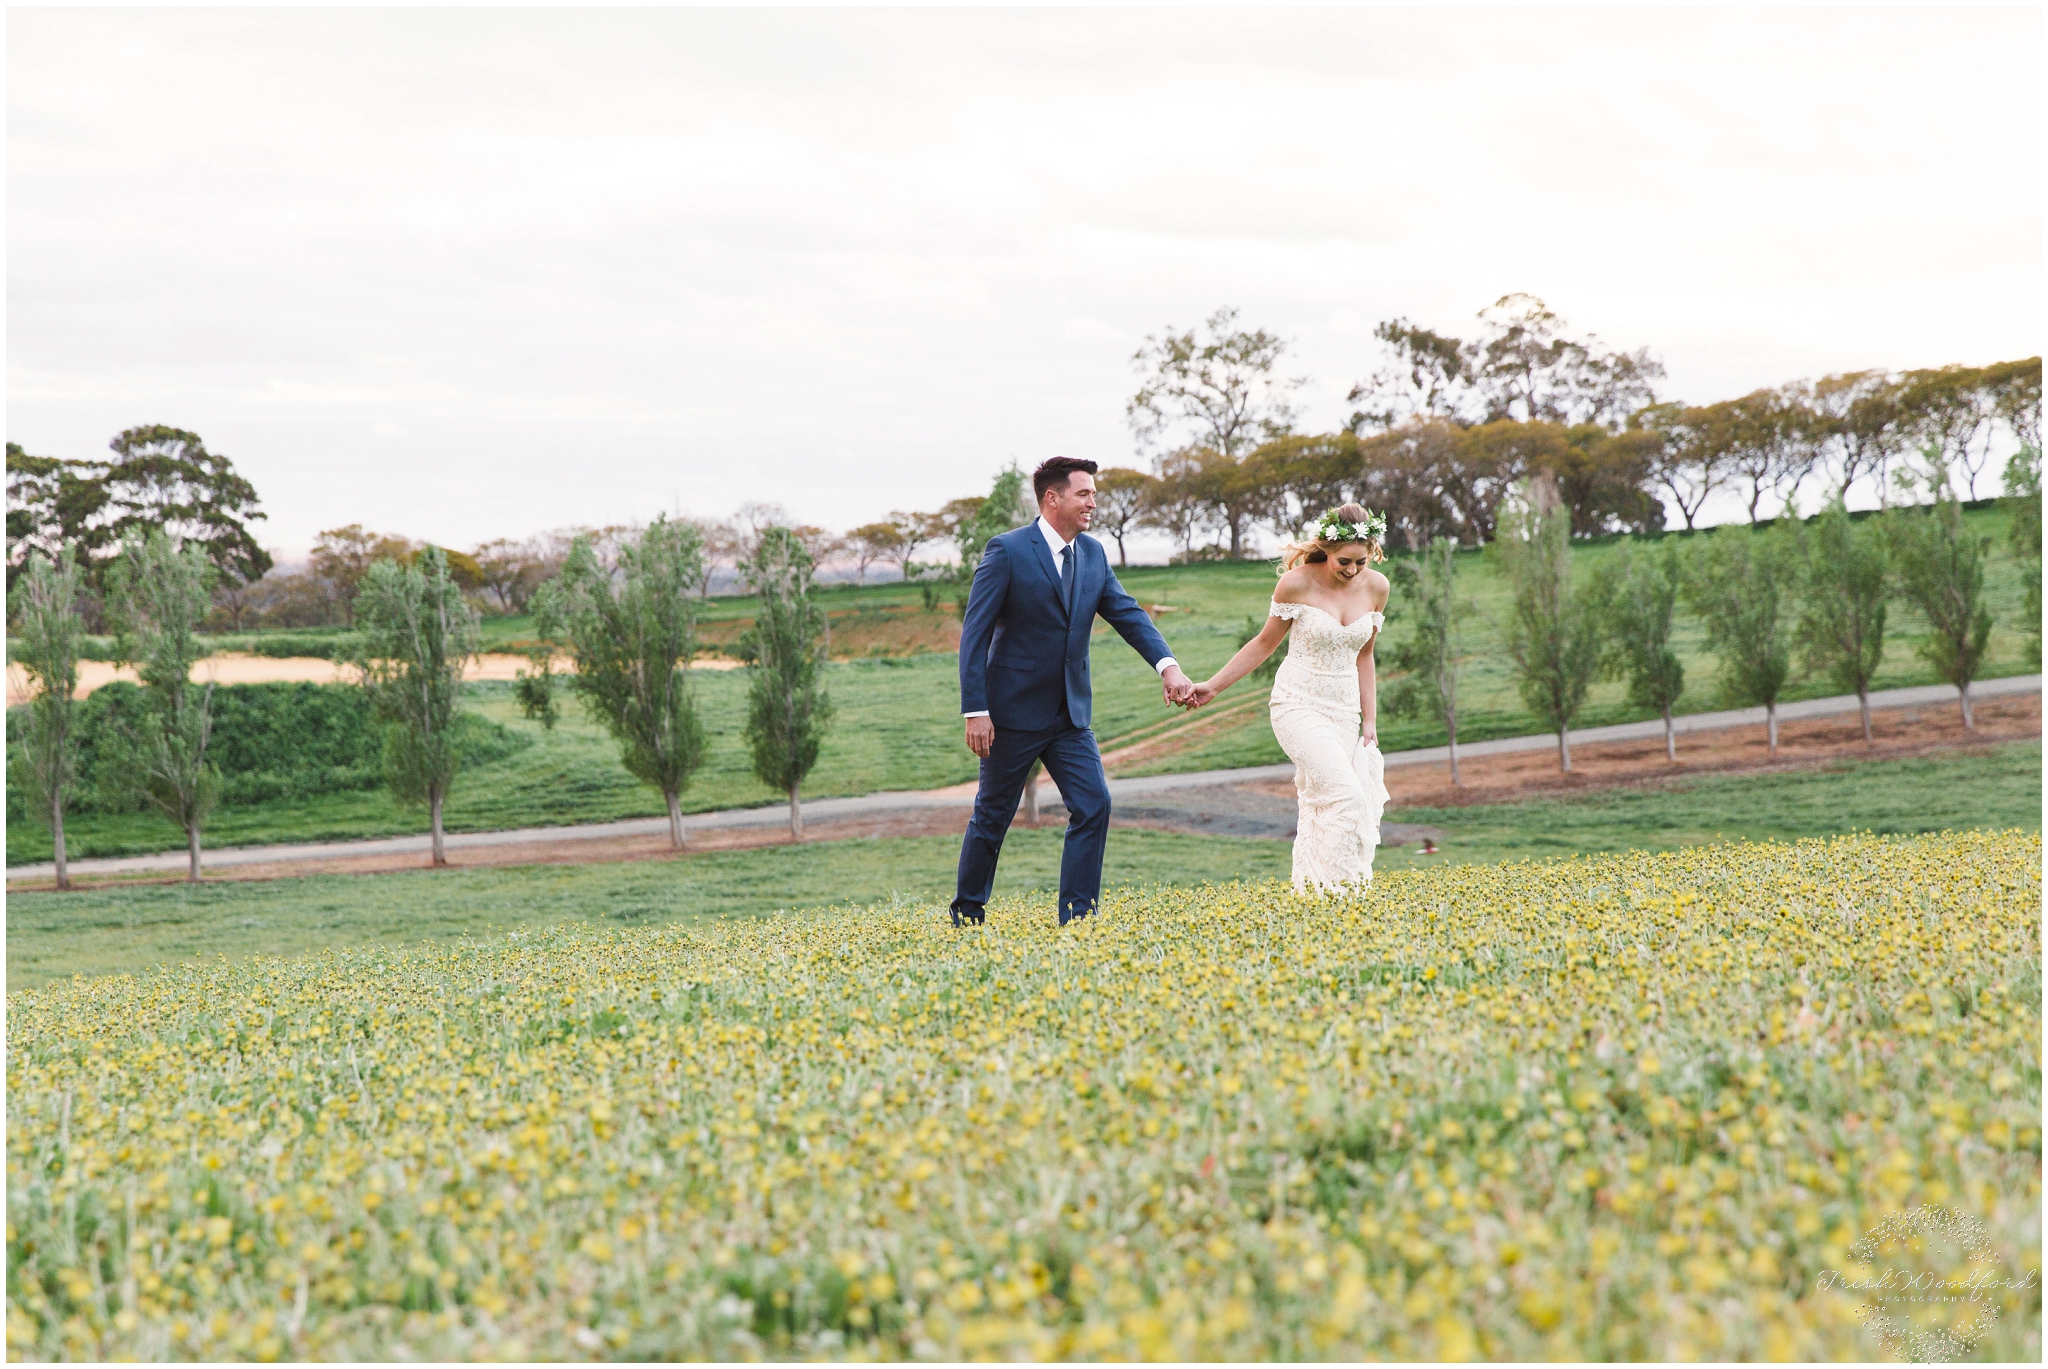 weddingphotoquarryfarm